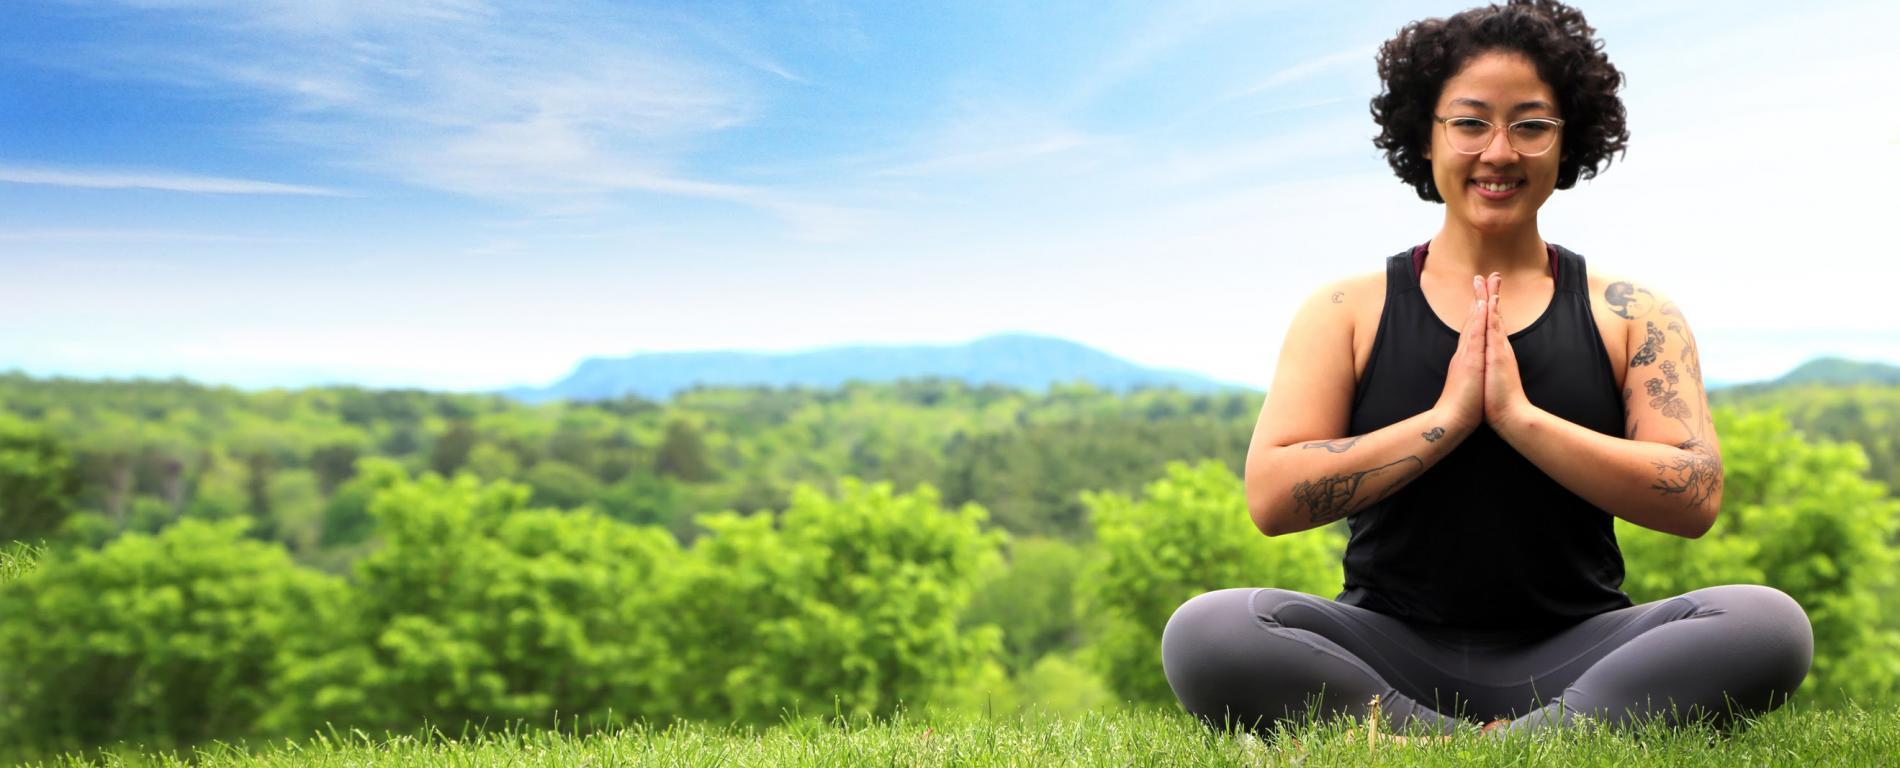 August 27 200 Hour Online Kripalu Yoga Teacher Training Kripalu